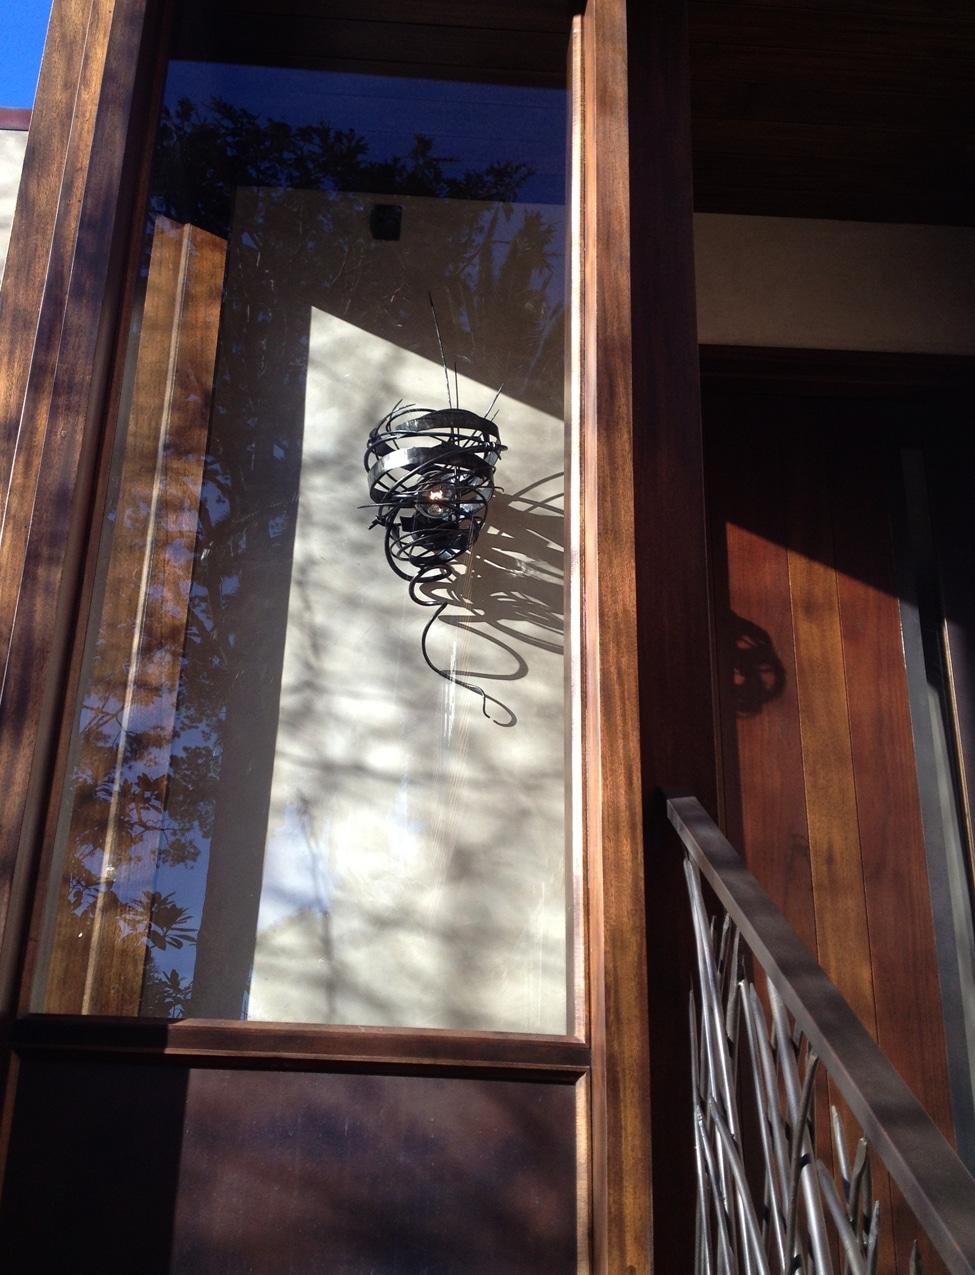 Blacksmith, Forged, Custom, Design, Daniel Hopper Design, Iron, Steel, Lighting, Wasp Nest, Sconce